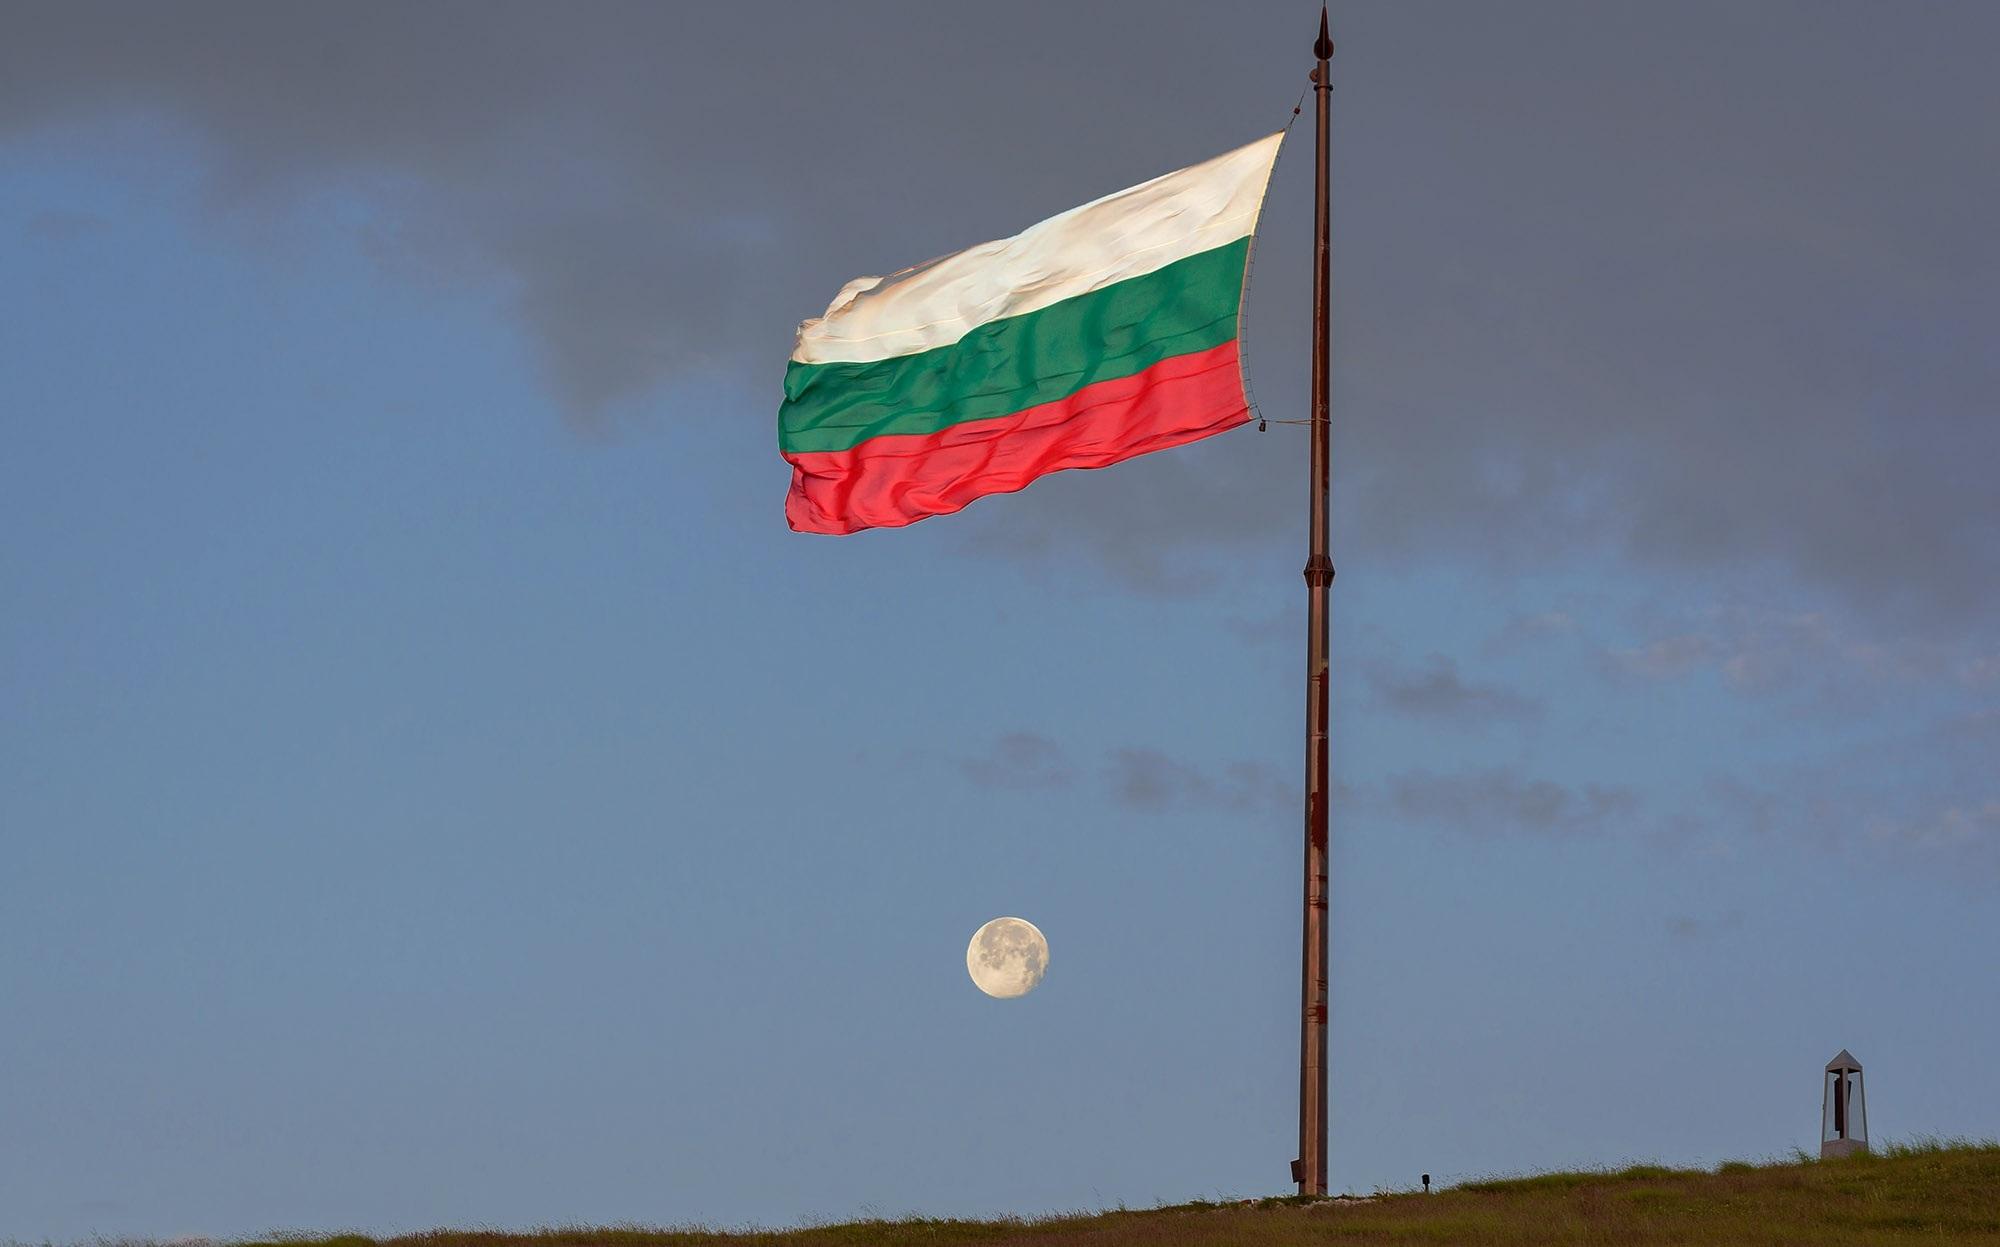 bg-flag-2018-2.jpg